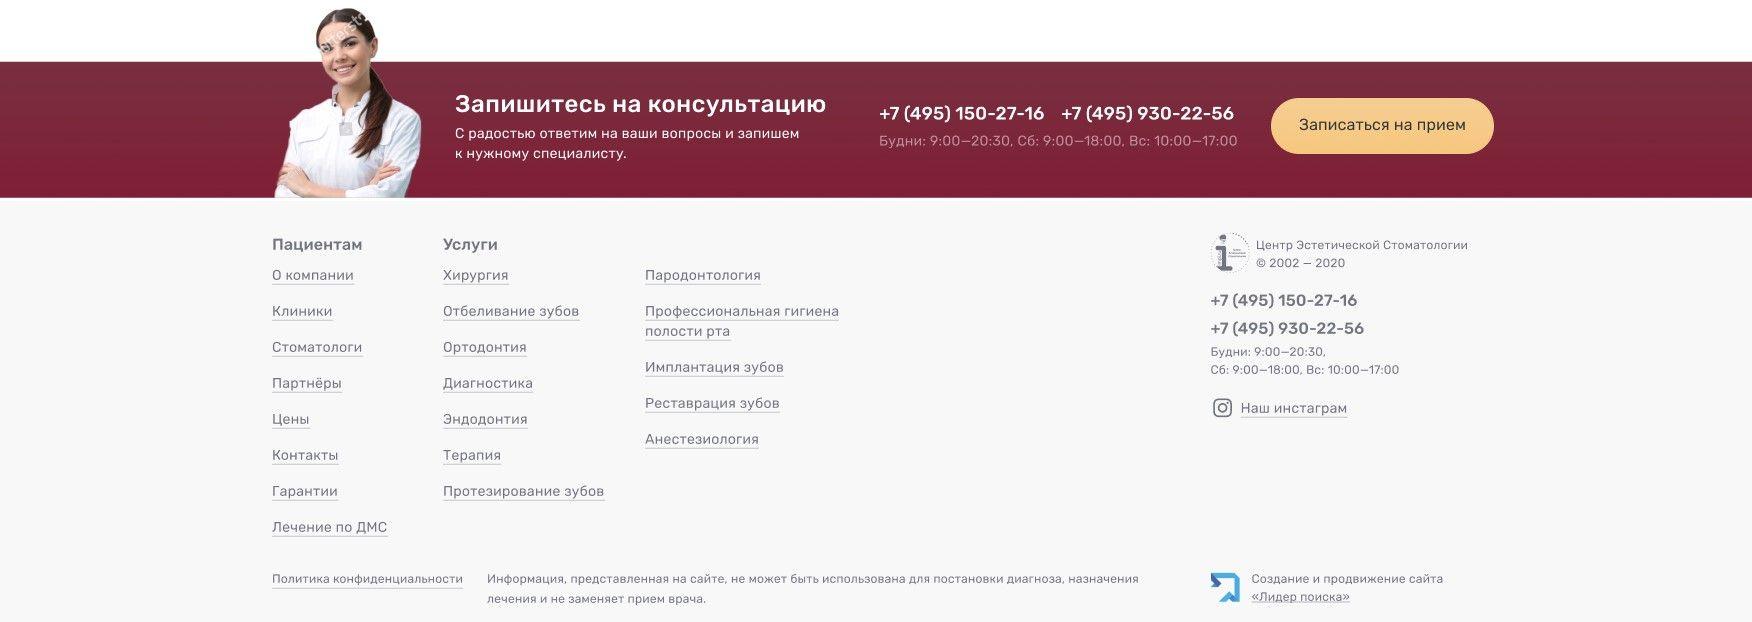 Перелинковка в подвале на примере www.impl.ru